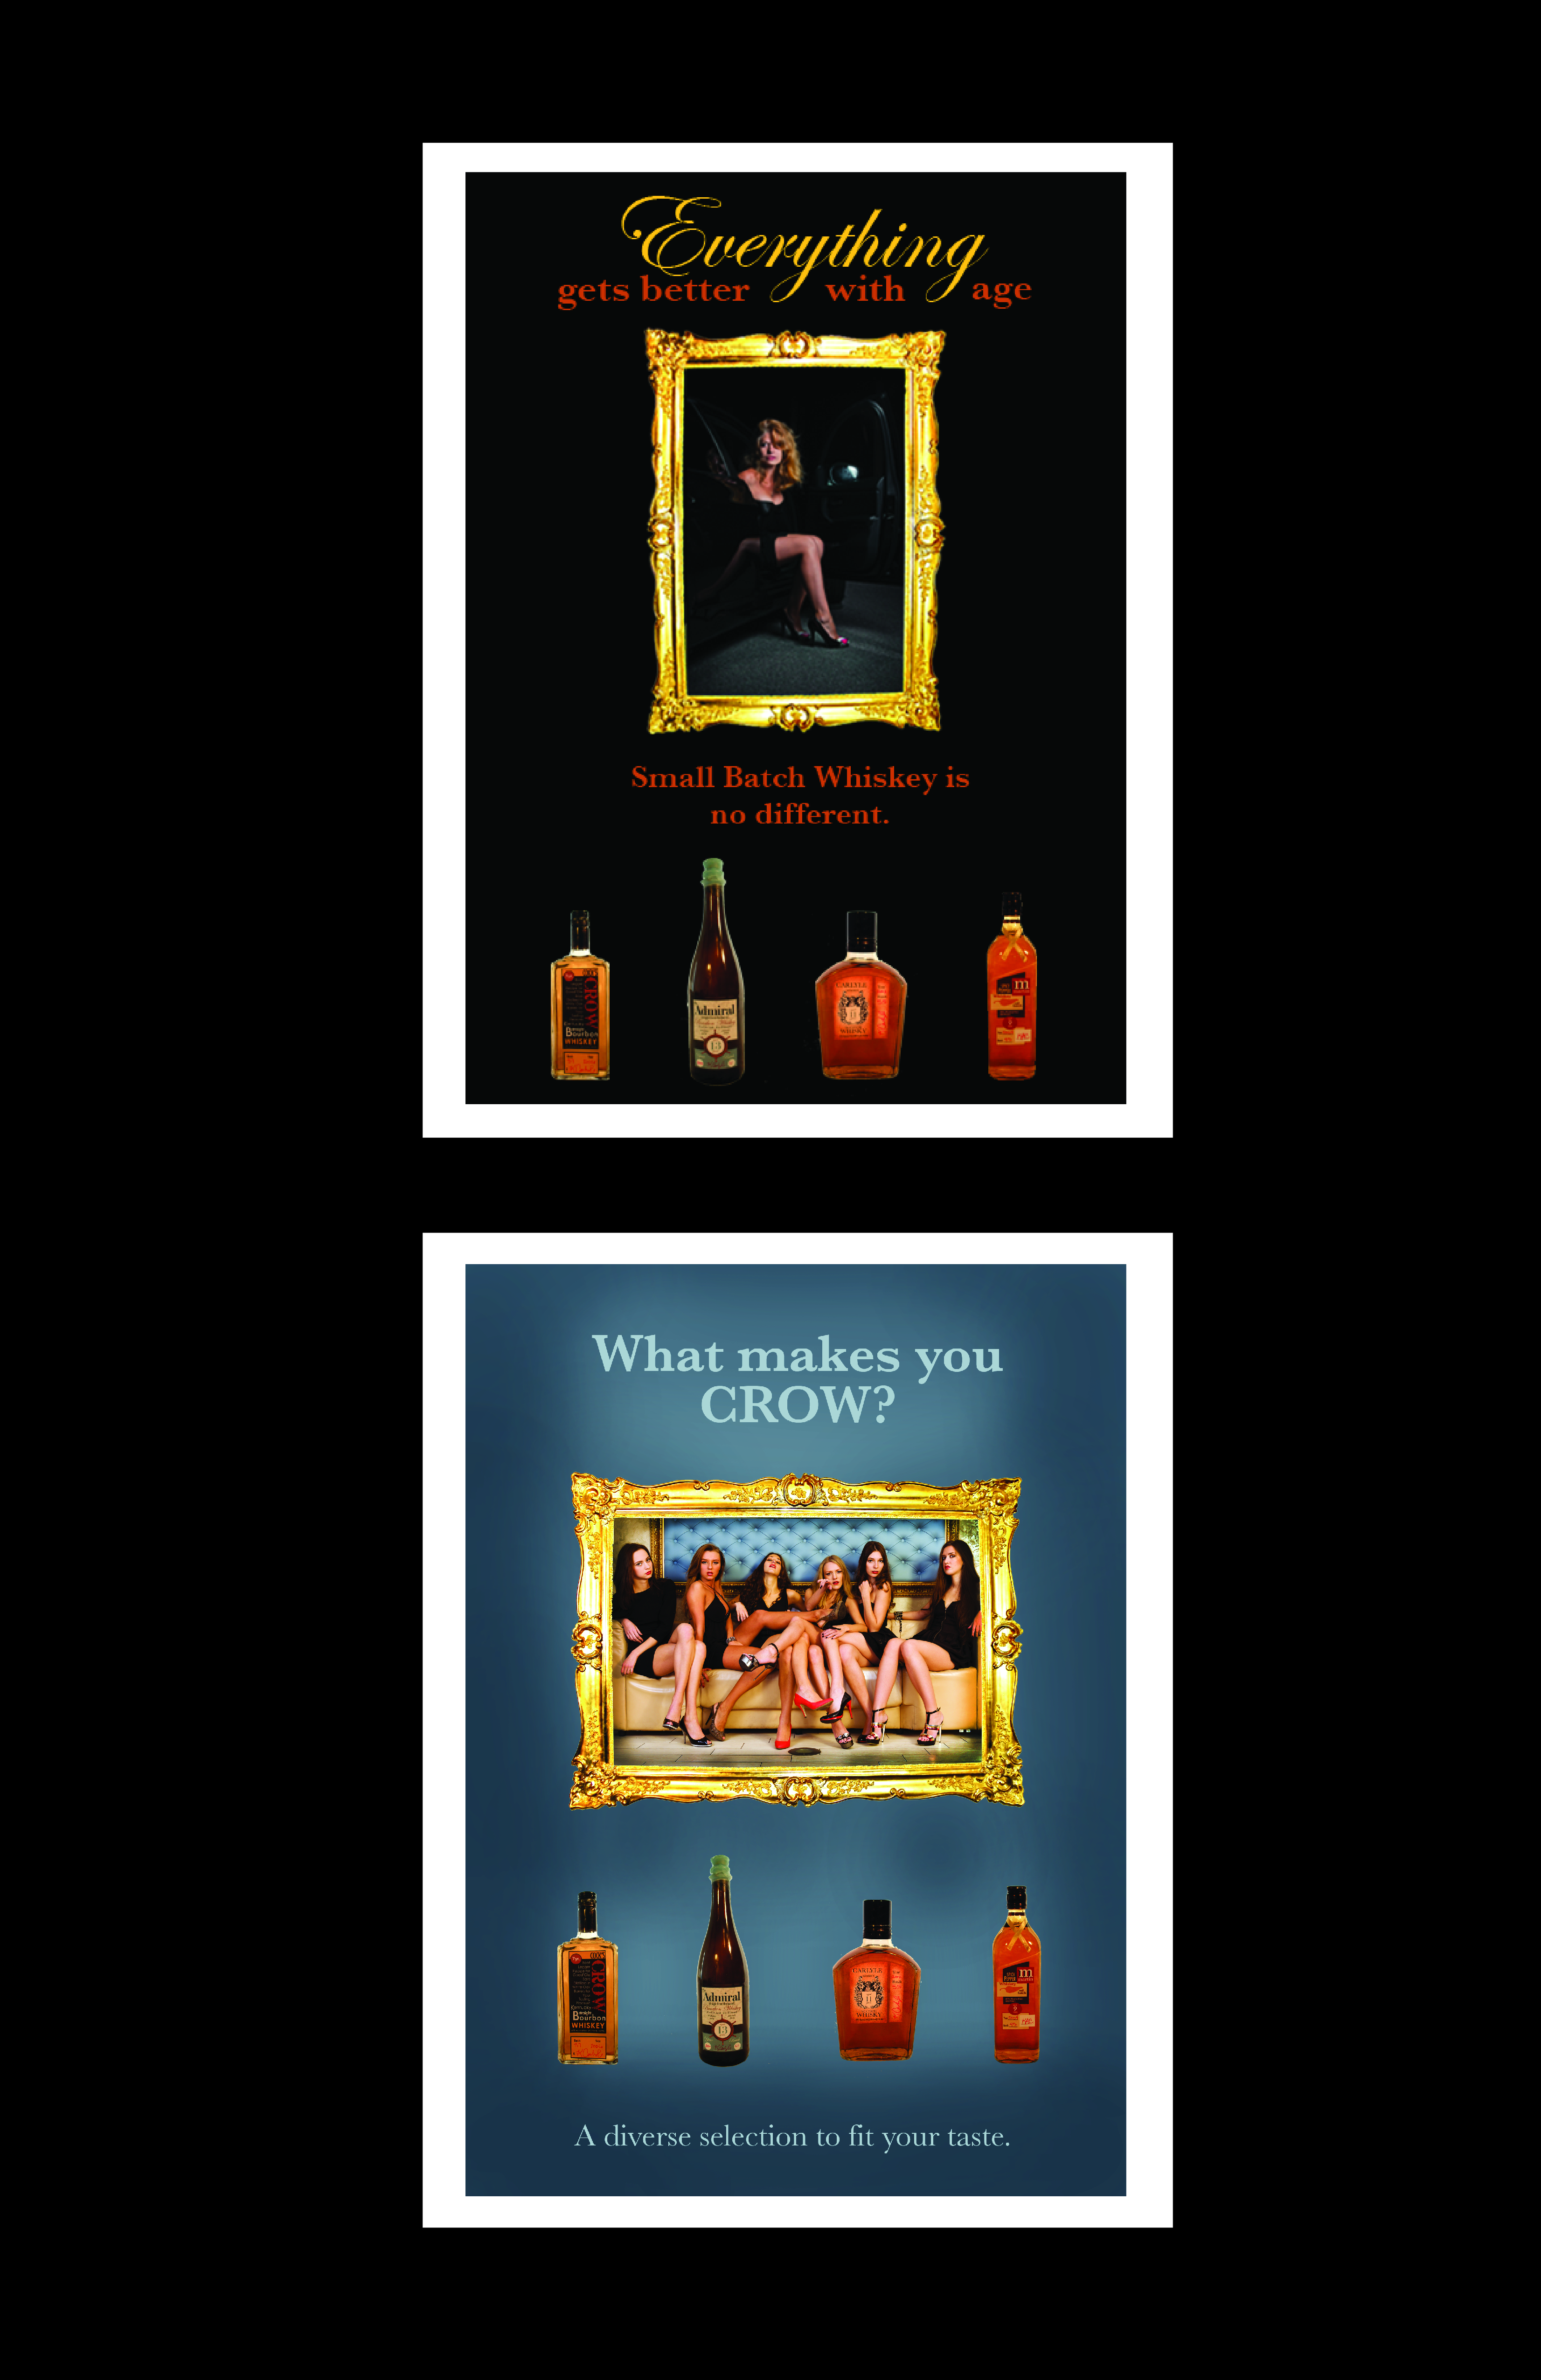 WhiskeyAds